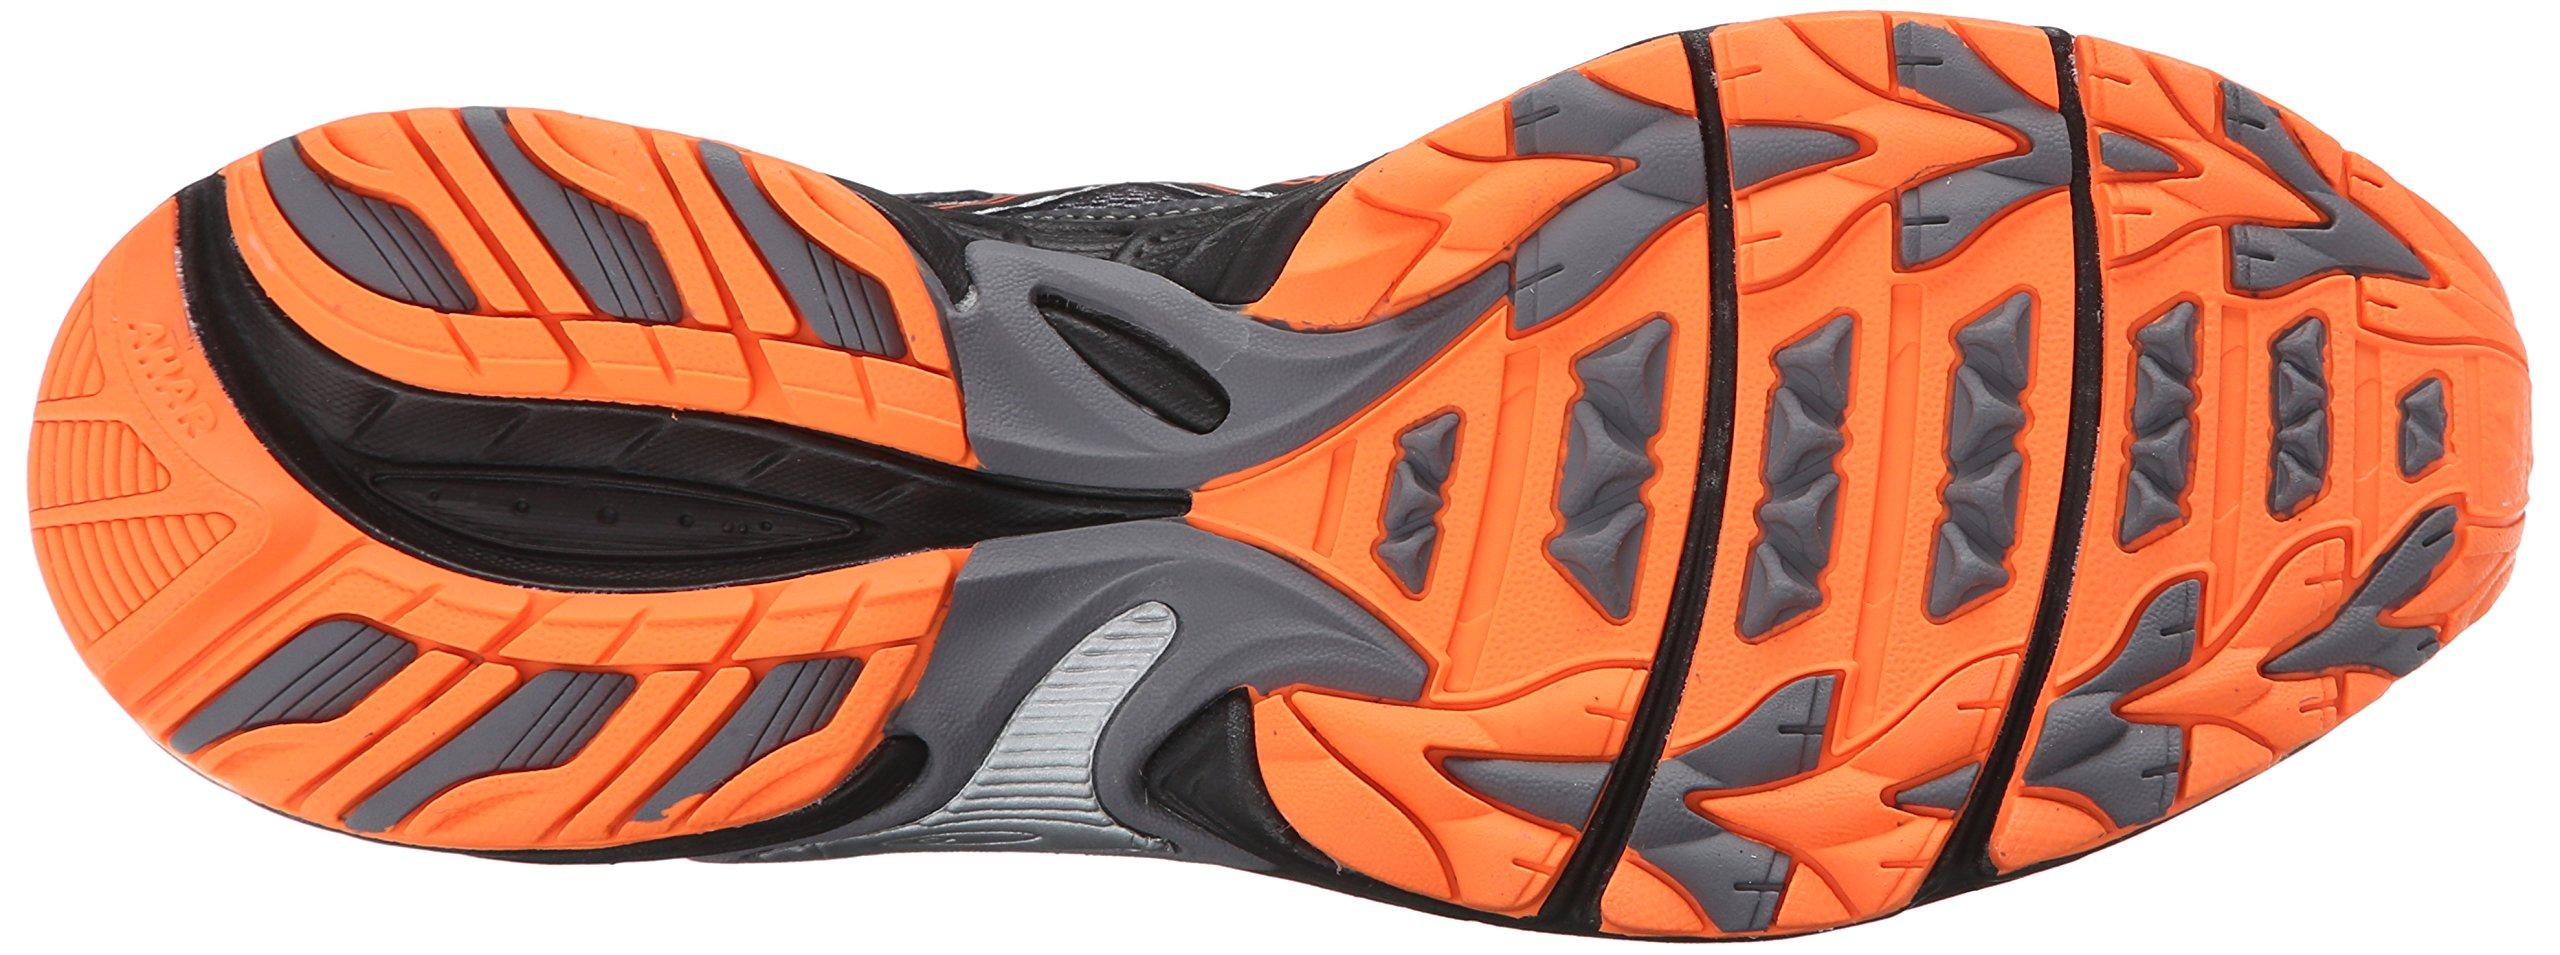 ASICS Men's Gel-Venture 5-M, Carbon/Black/Hot Orange 7.5 M US by ASICS (Image #3)